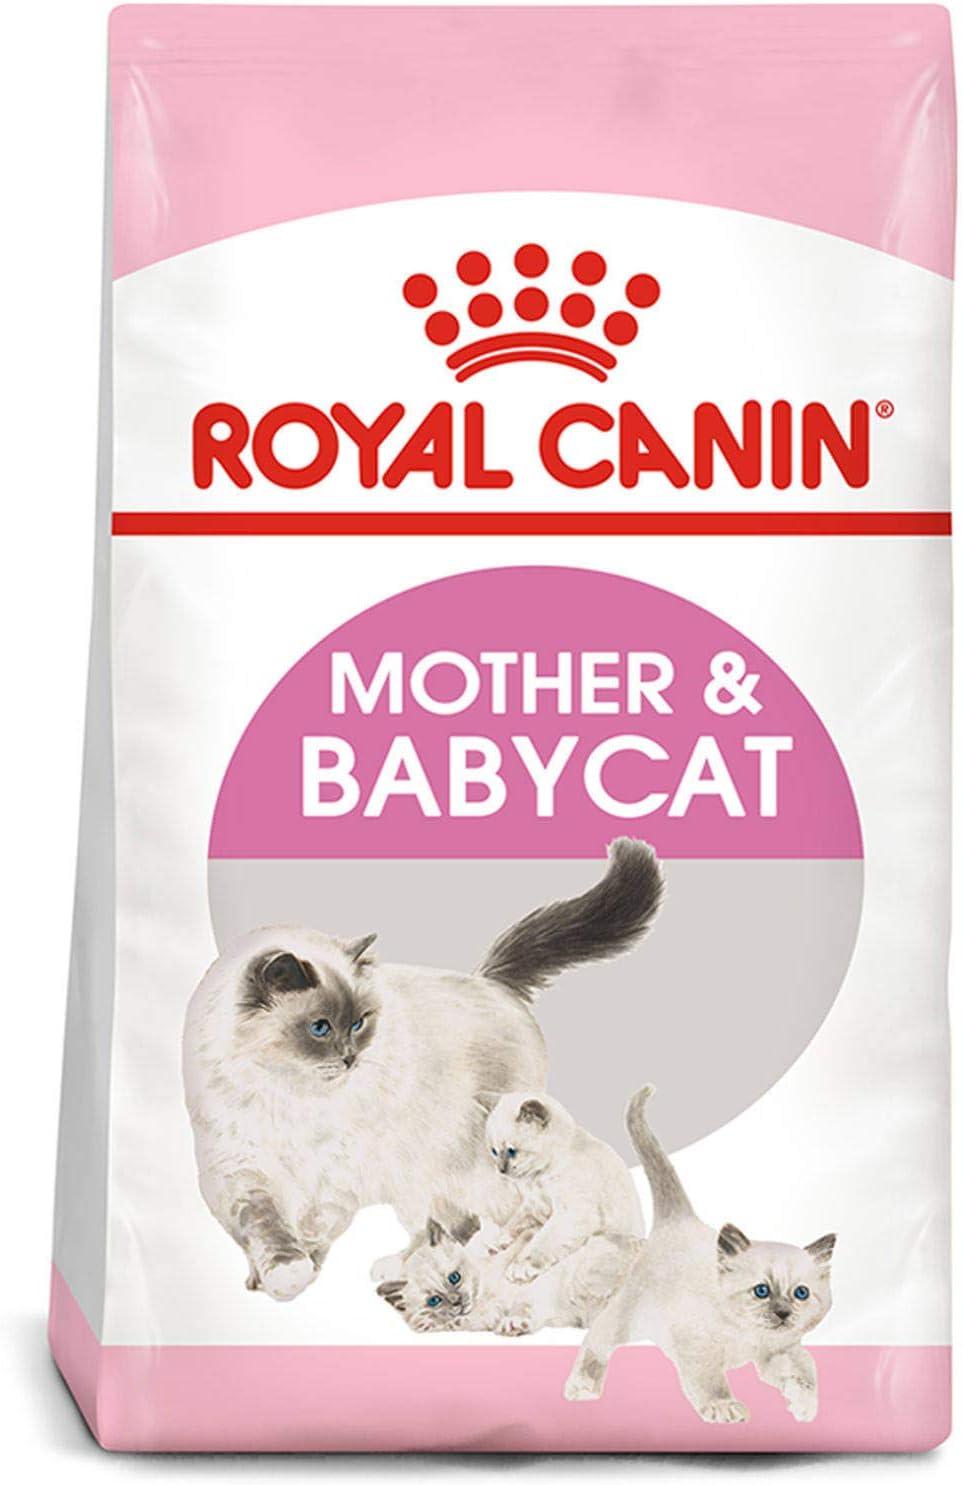 Royal Canin Mother Babycat 10kg Amazon Co Uk Kitchen Home